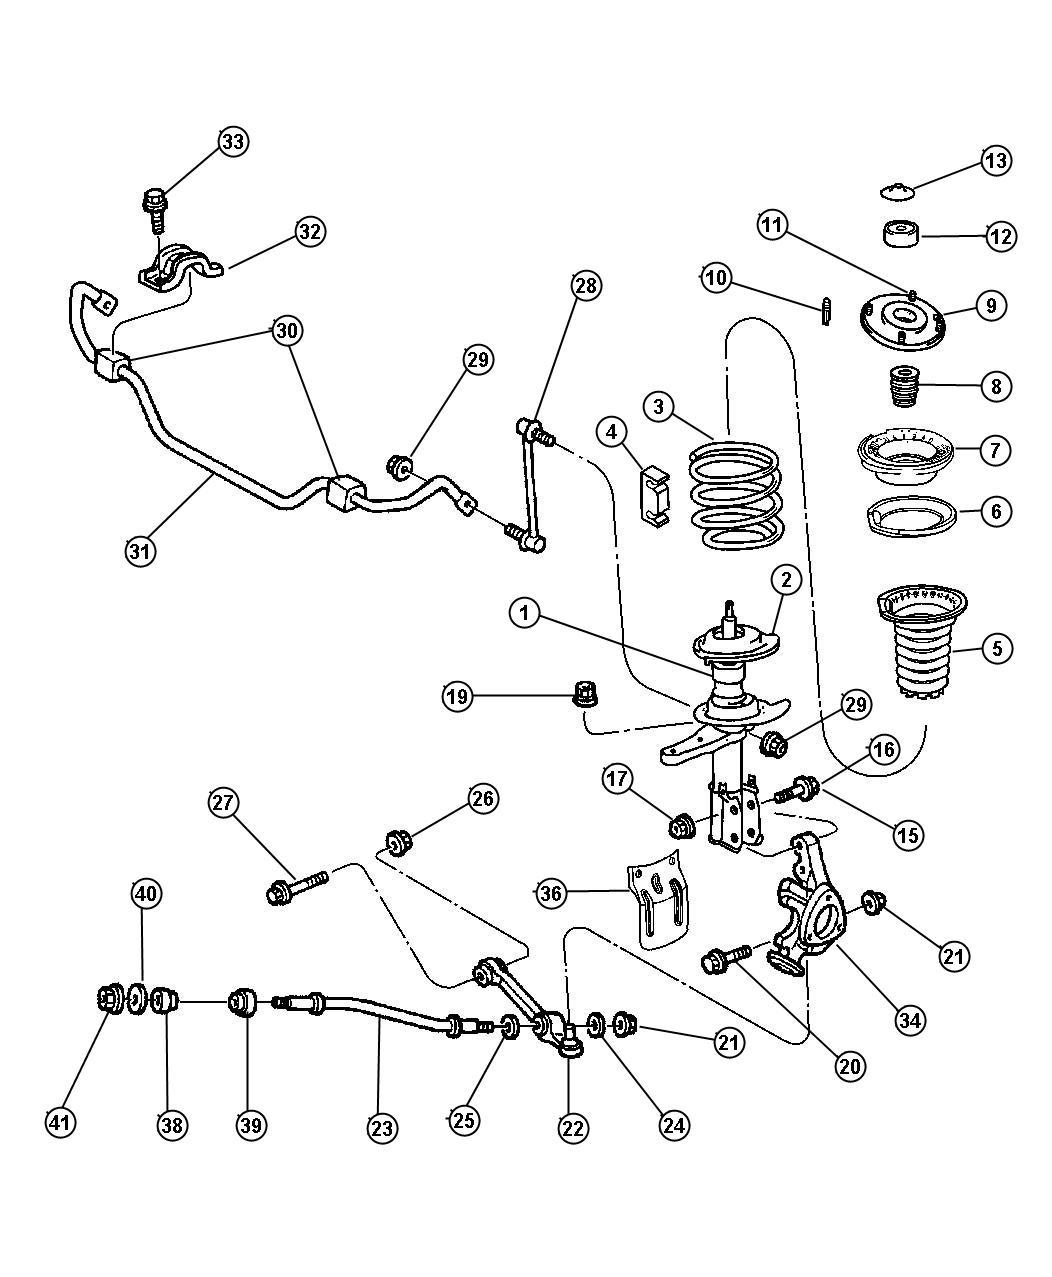 2002 Dodge Intrepid Bushing  Lower Control Arm  Rear  Lca Strut To Cradle Rear  Strut To